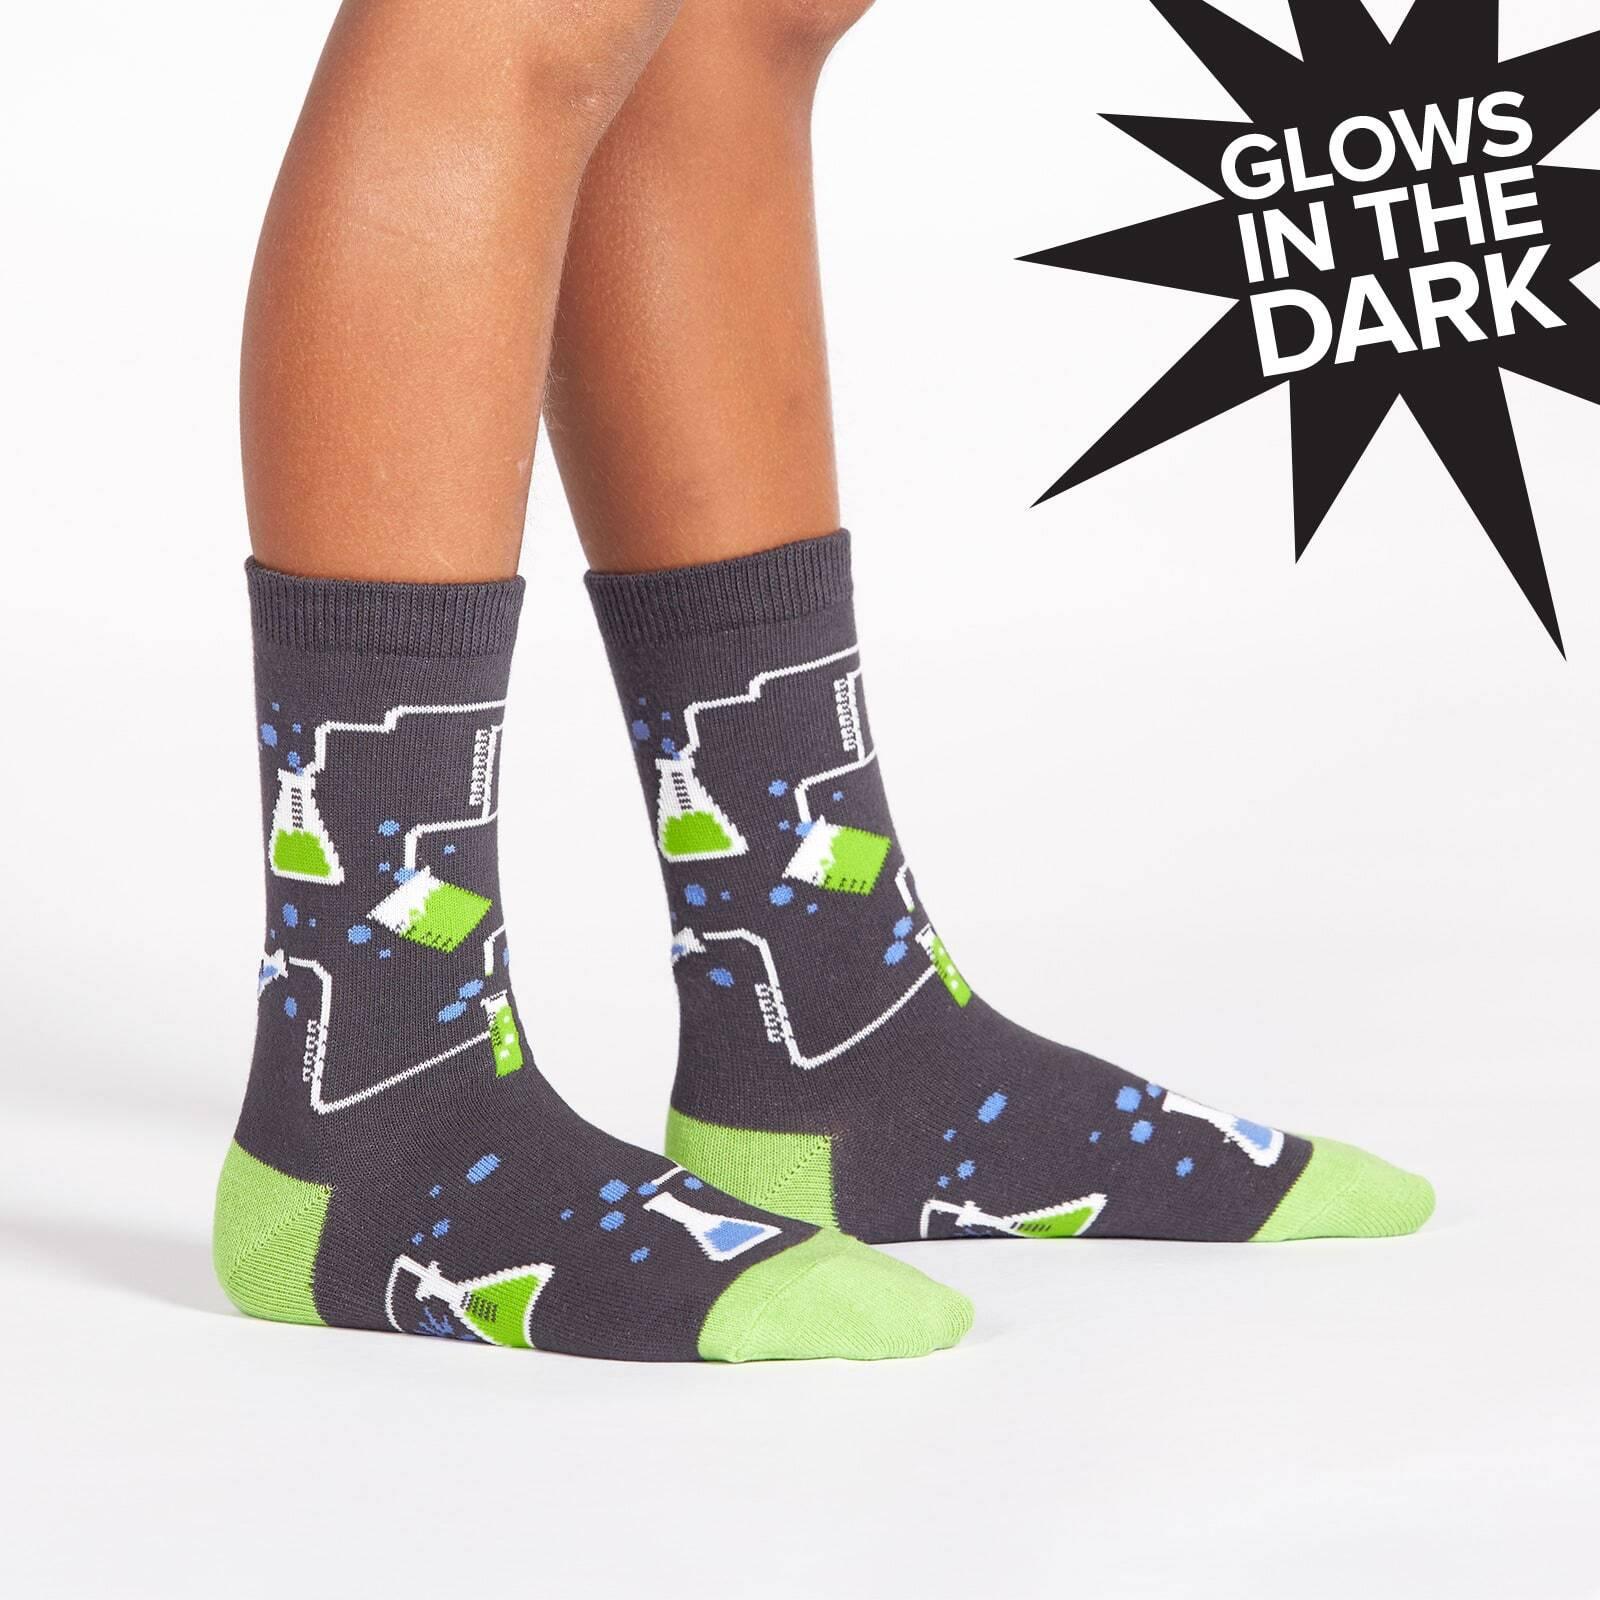 model wearing Laboratory Crew Socks - Glow In The Dark - Youth